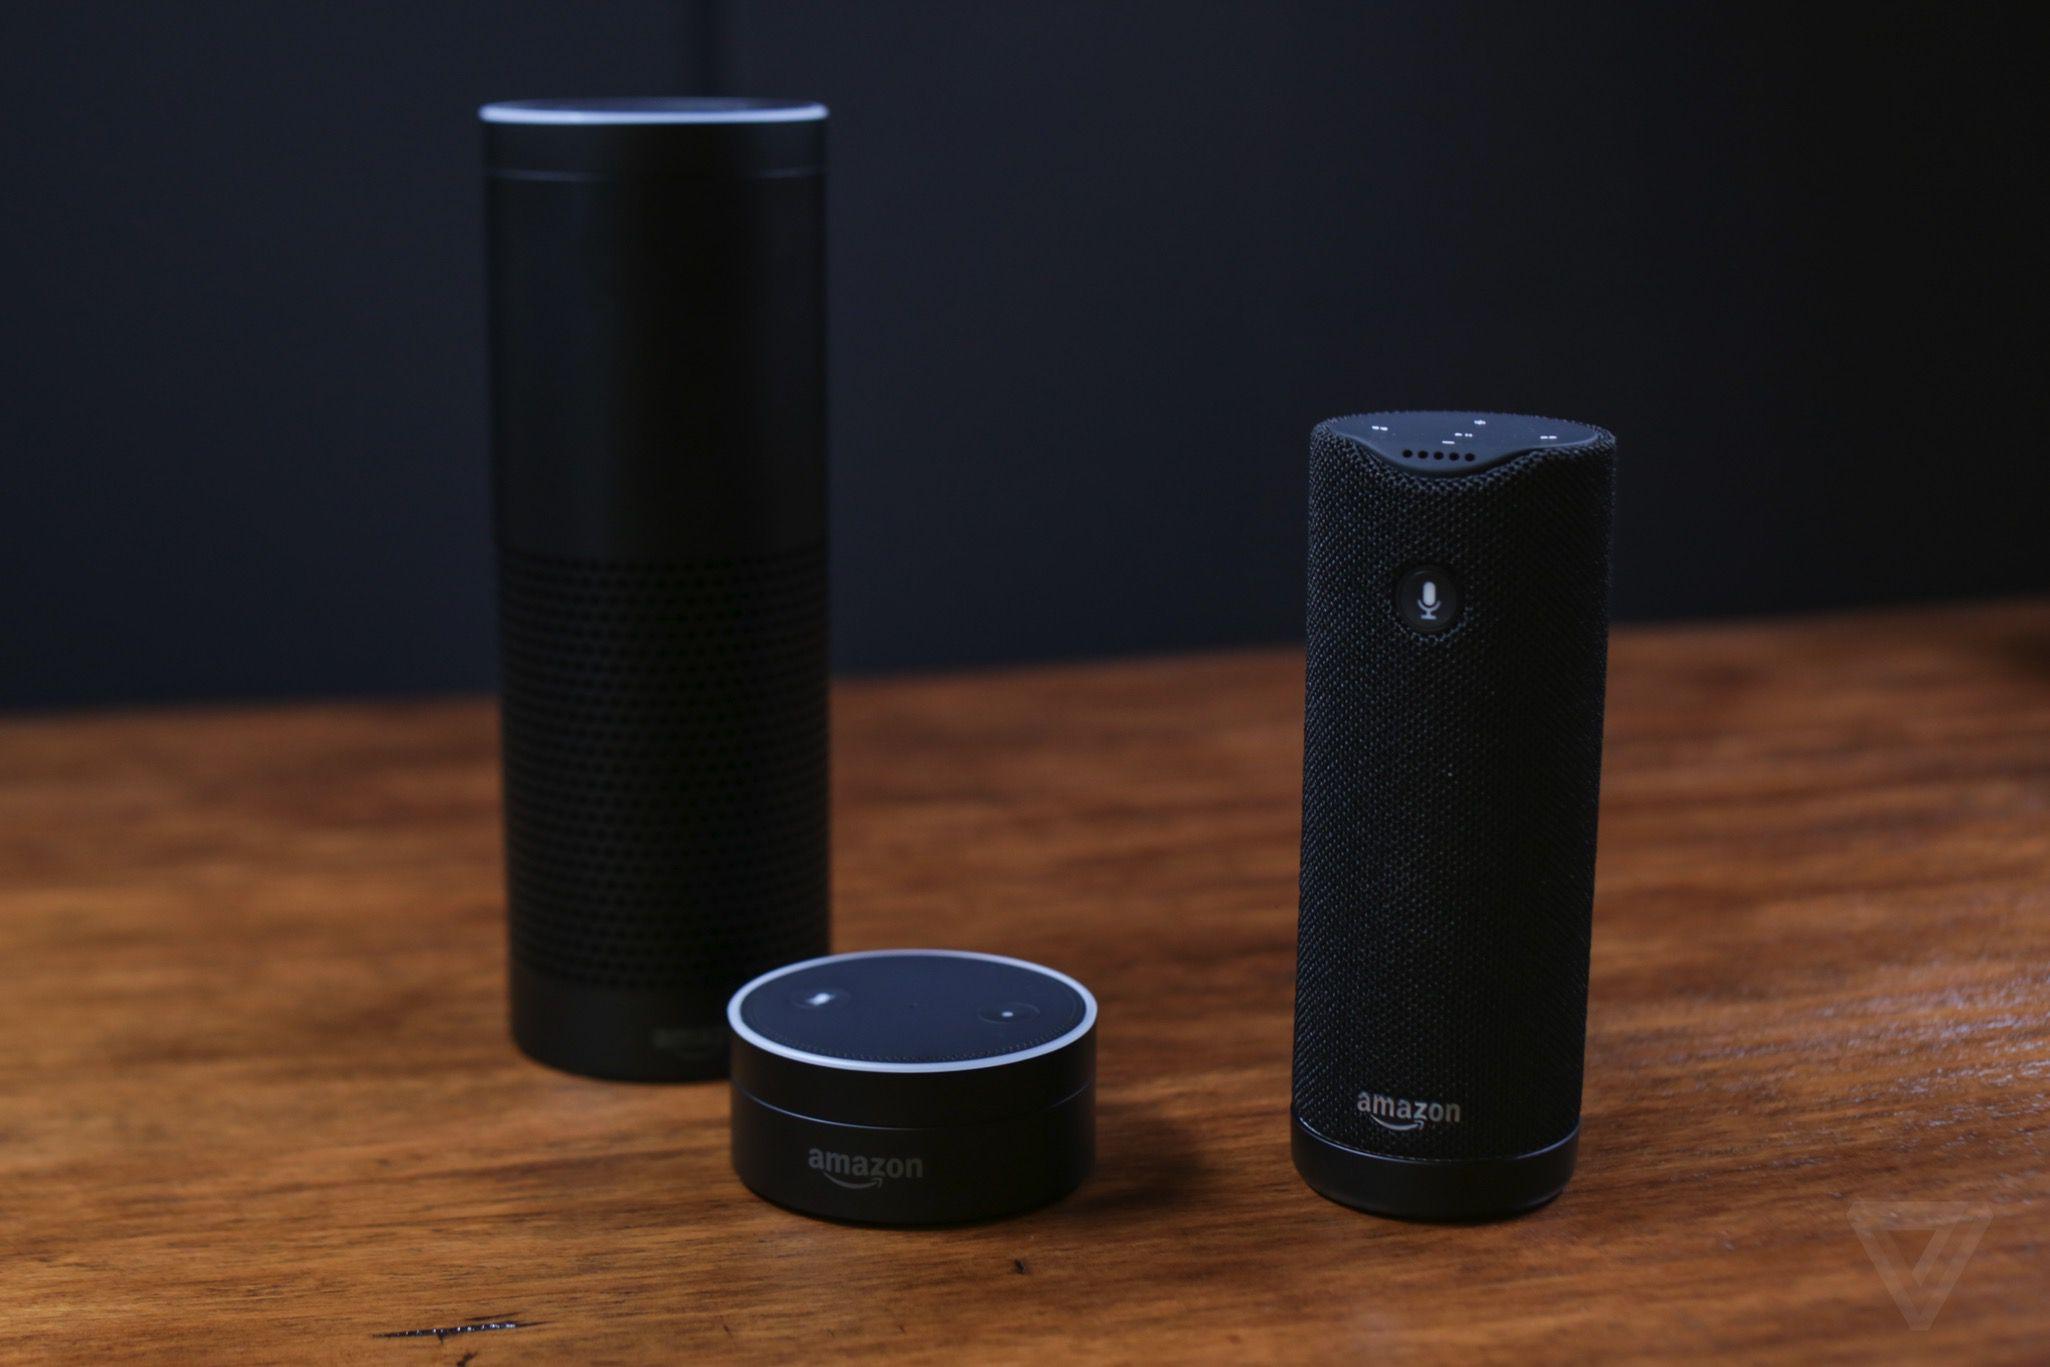 amazon 39 s echo dot lets you put alexa inside any speaker. Black Bedroom Furniture Sets. Home Design Ideas